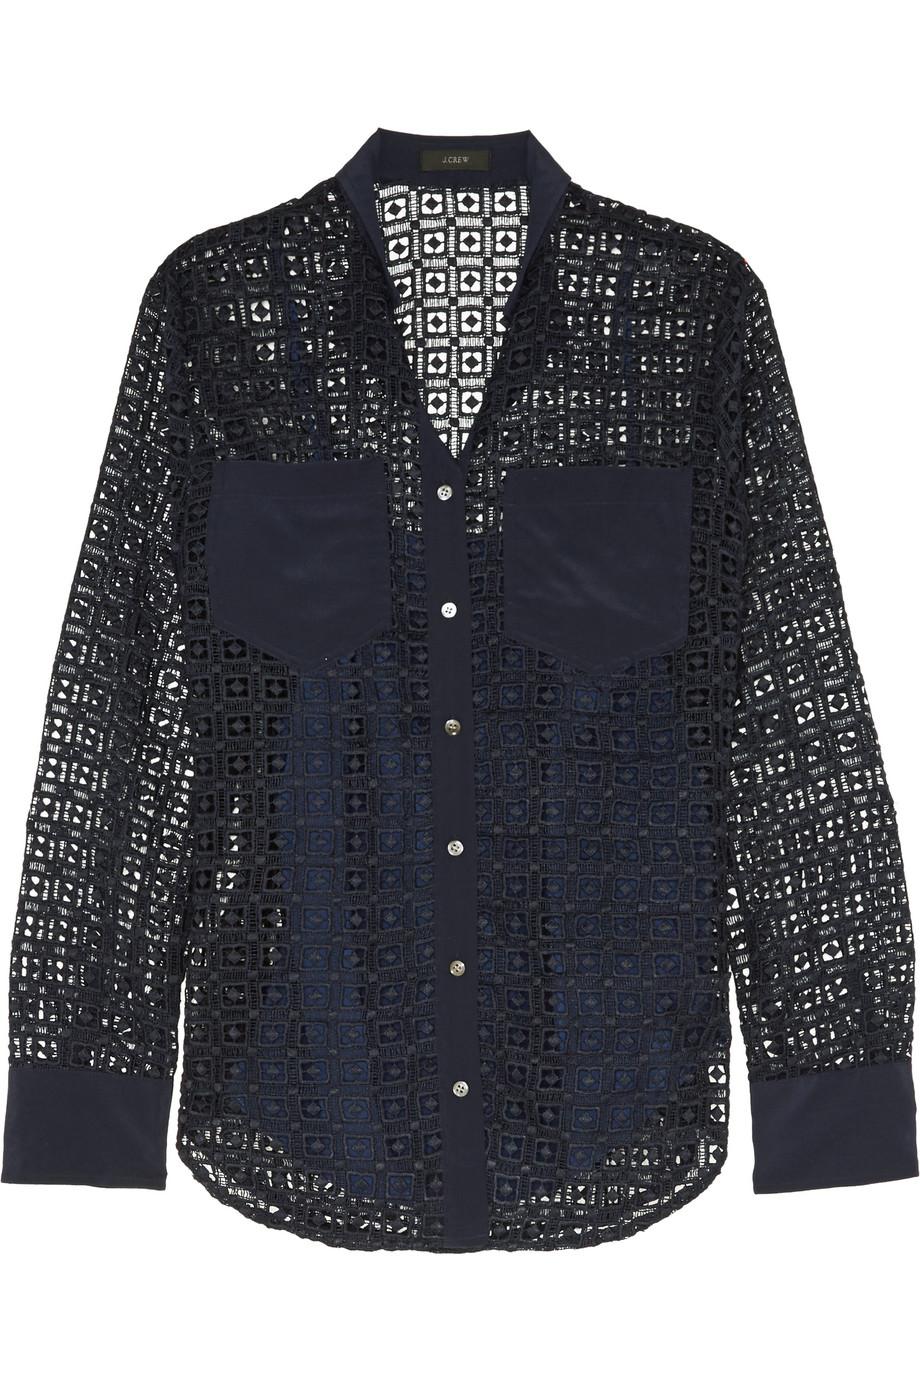 J.Crew Silk-Paneled Crocheted Lace Shirt, Midnight Blue, Women's, Size: 0